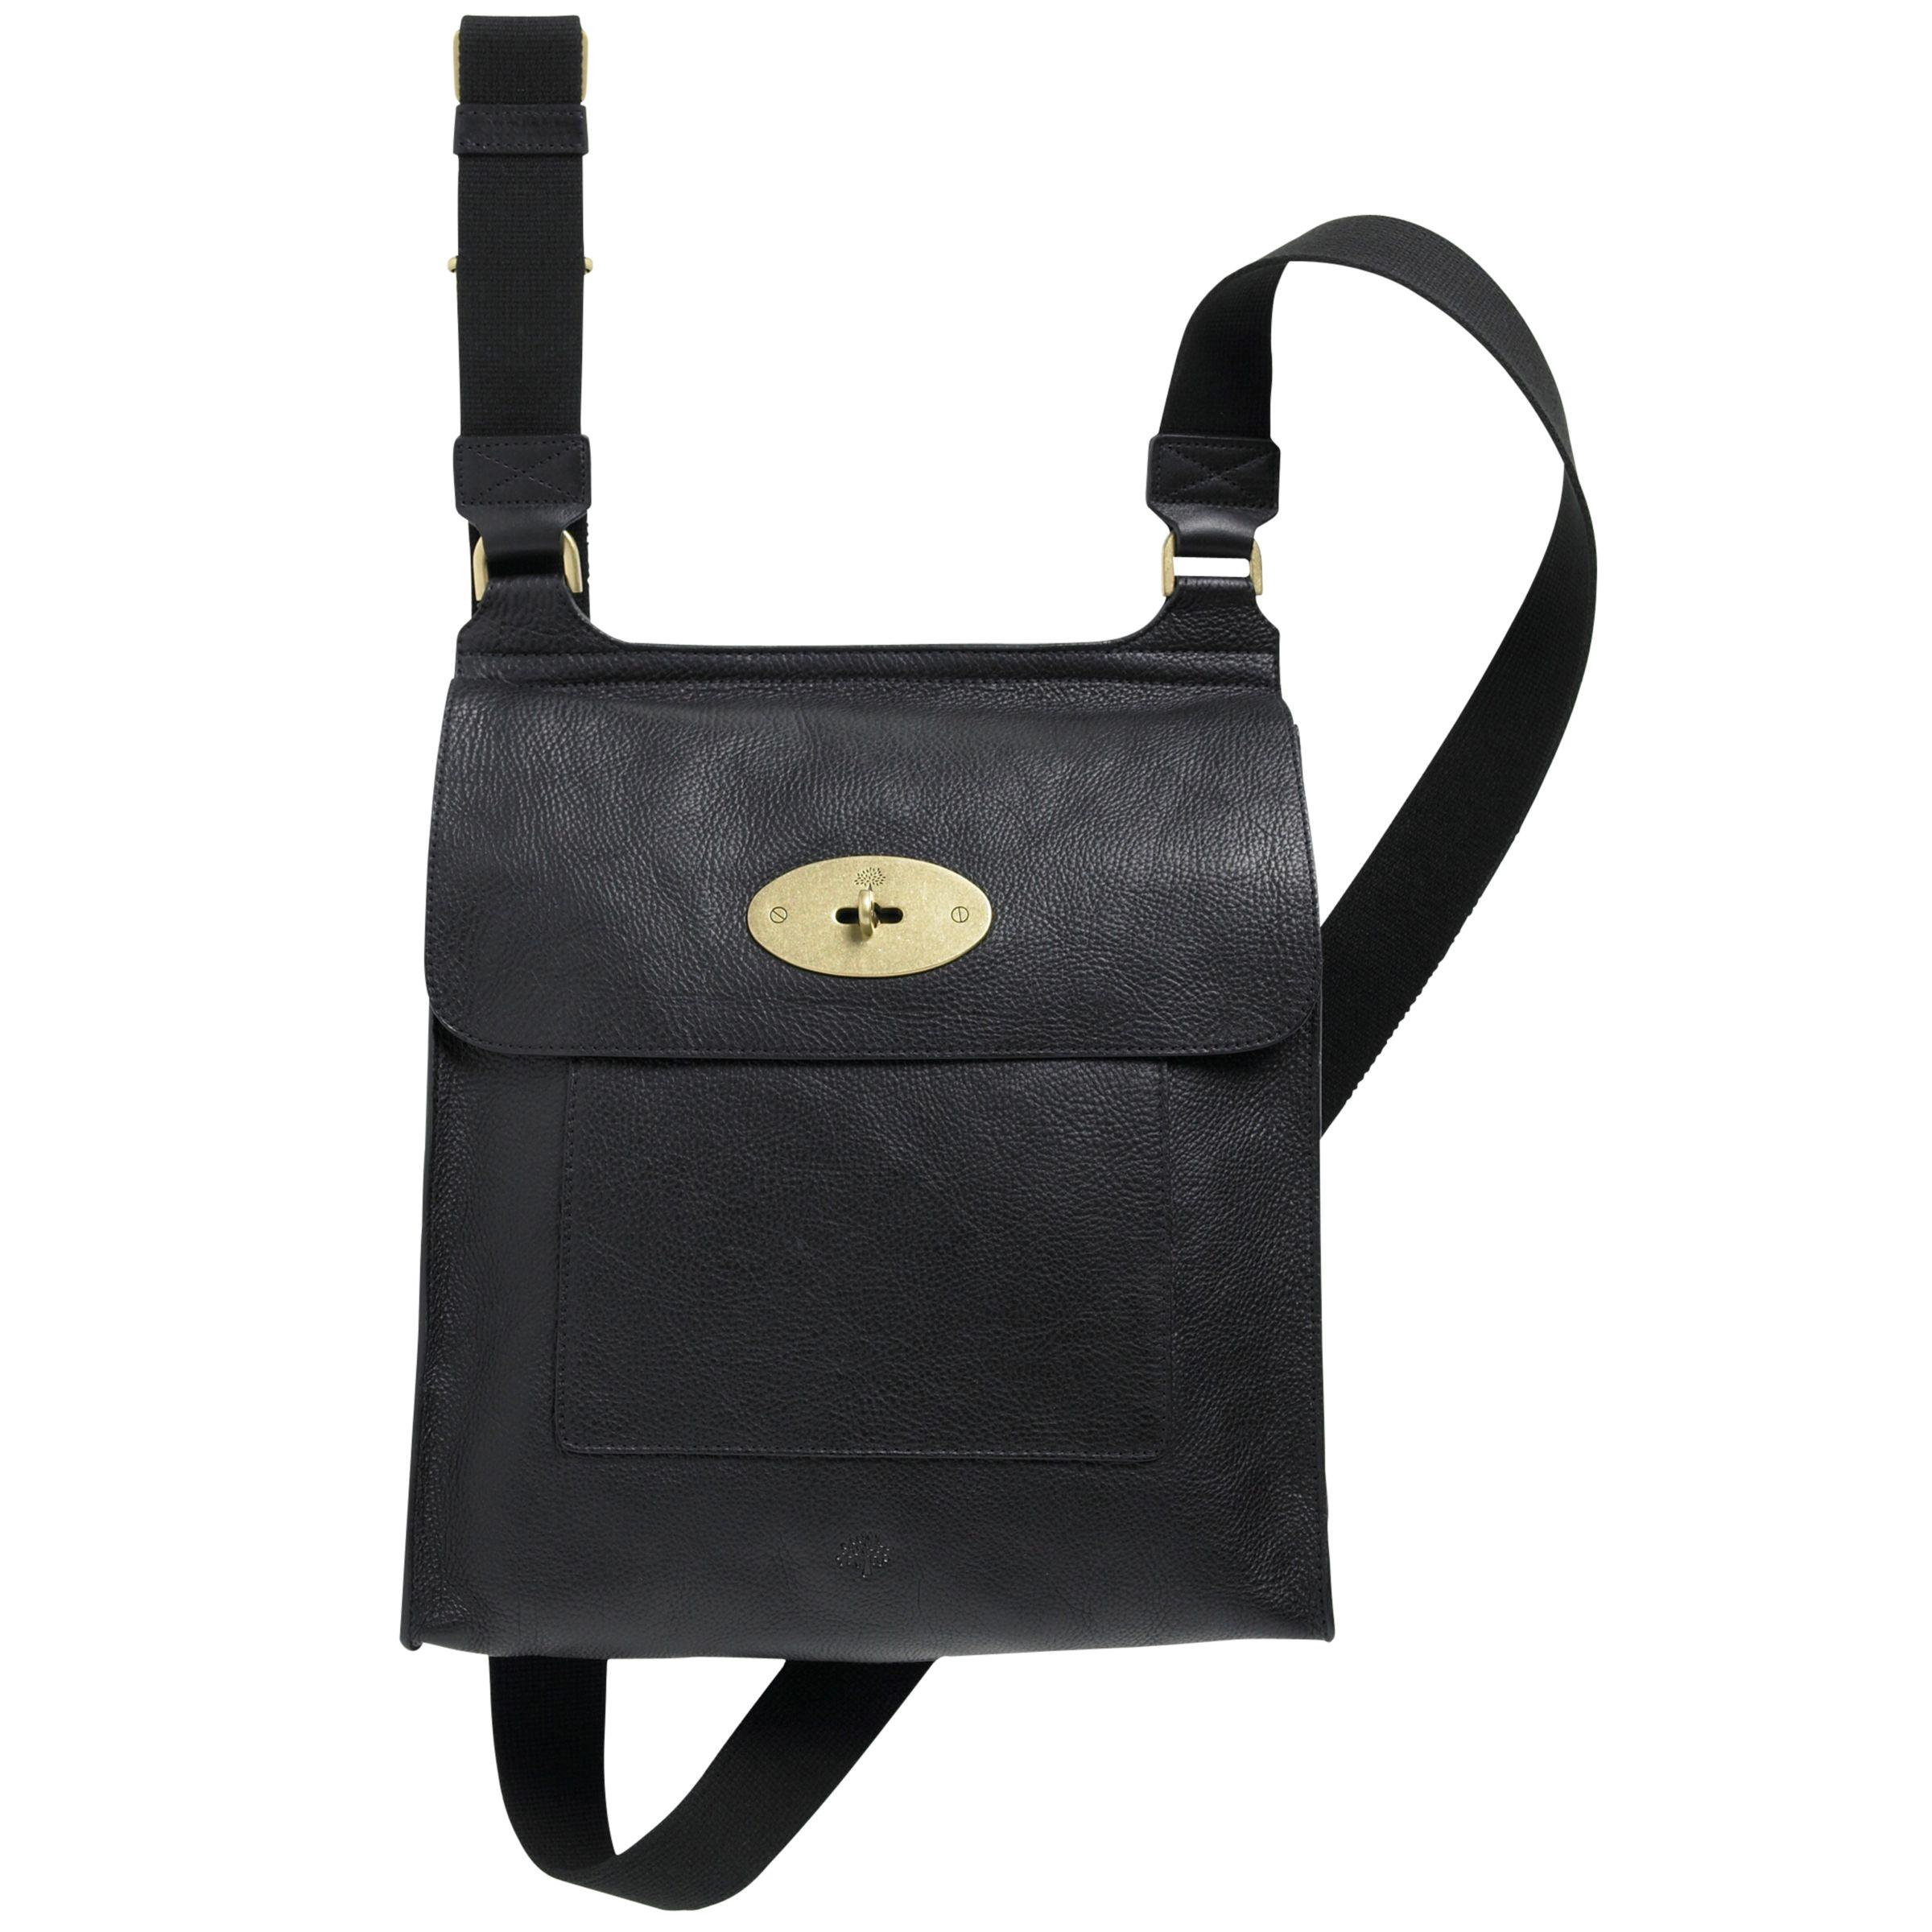 ded8d177e813 Mulberry Antony Leather Messenger Cross Body Bag at John Lewis & Partners